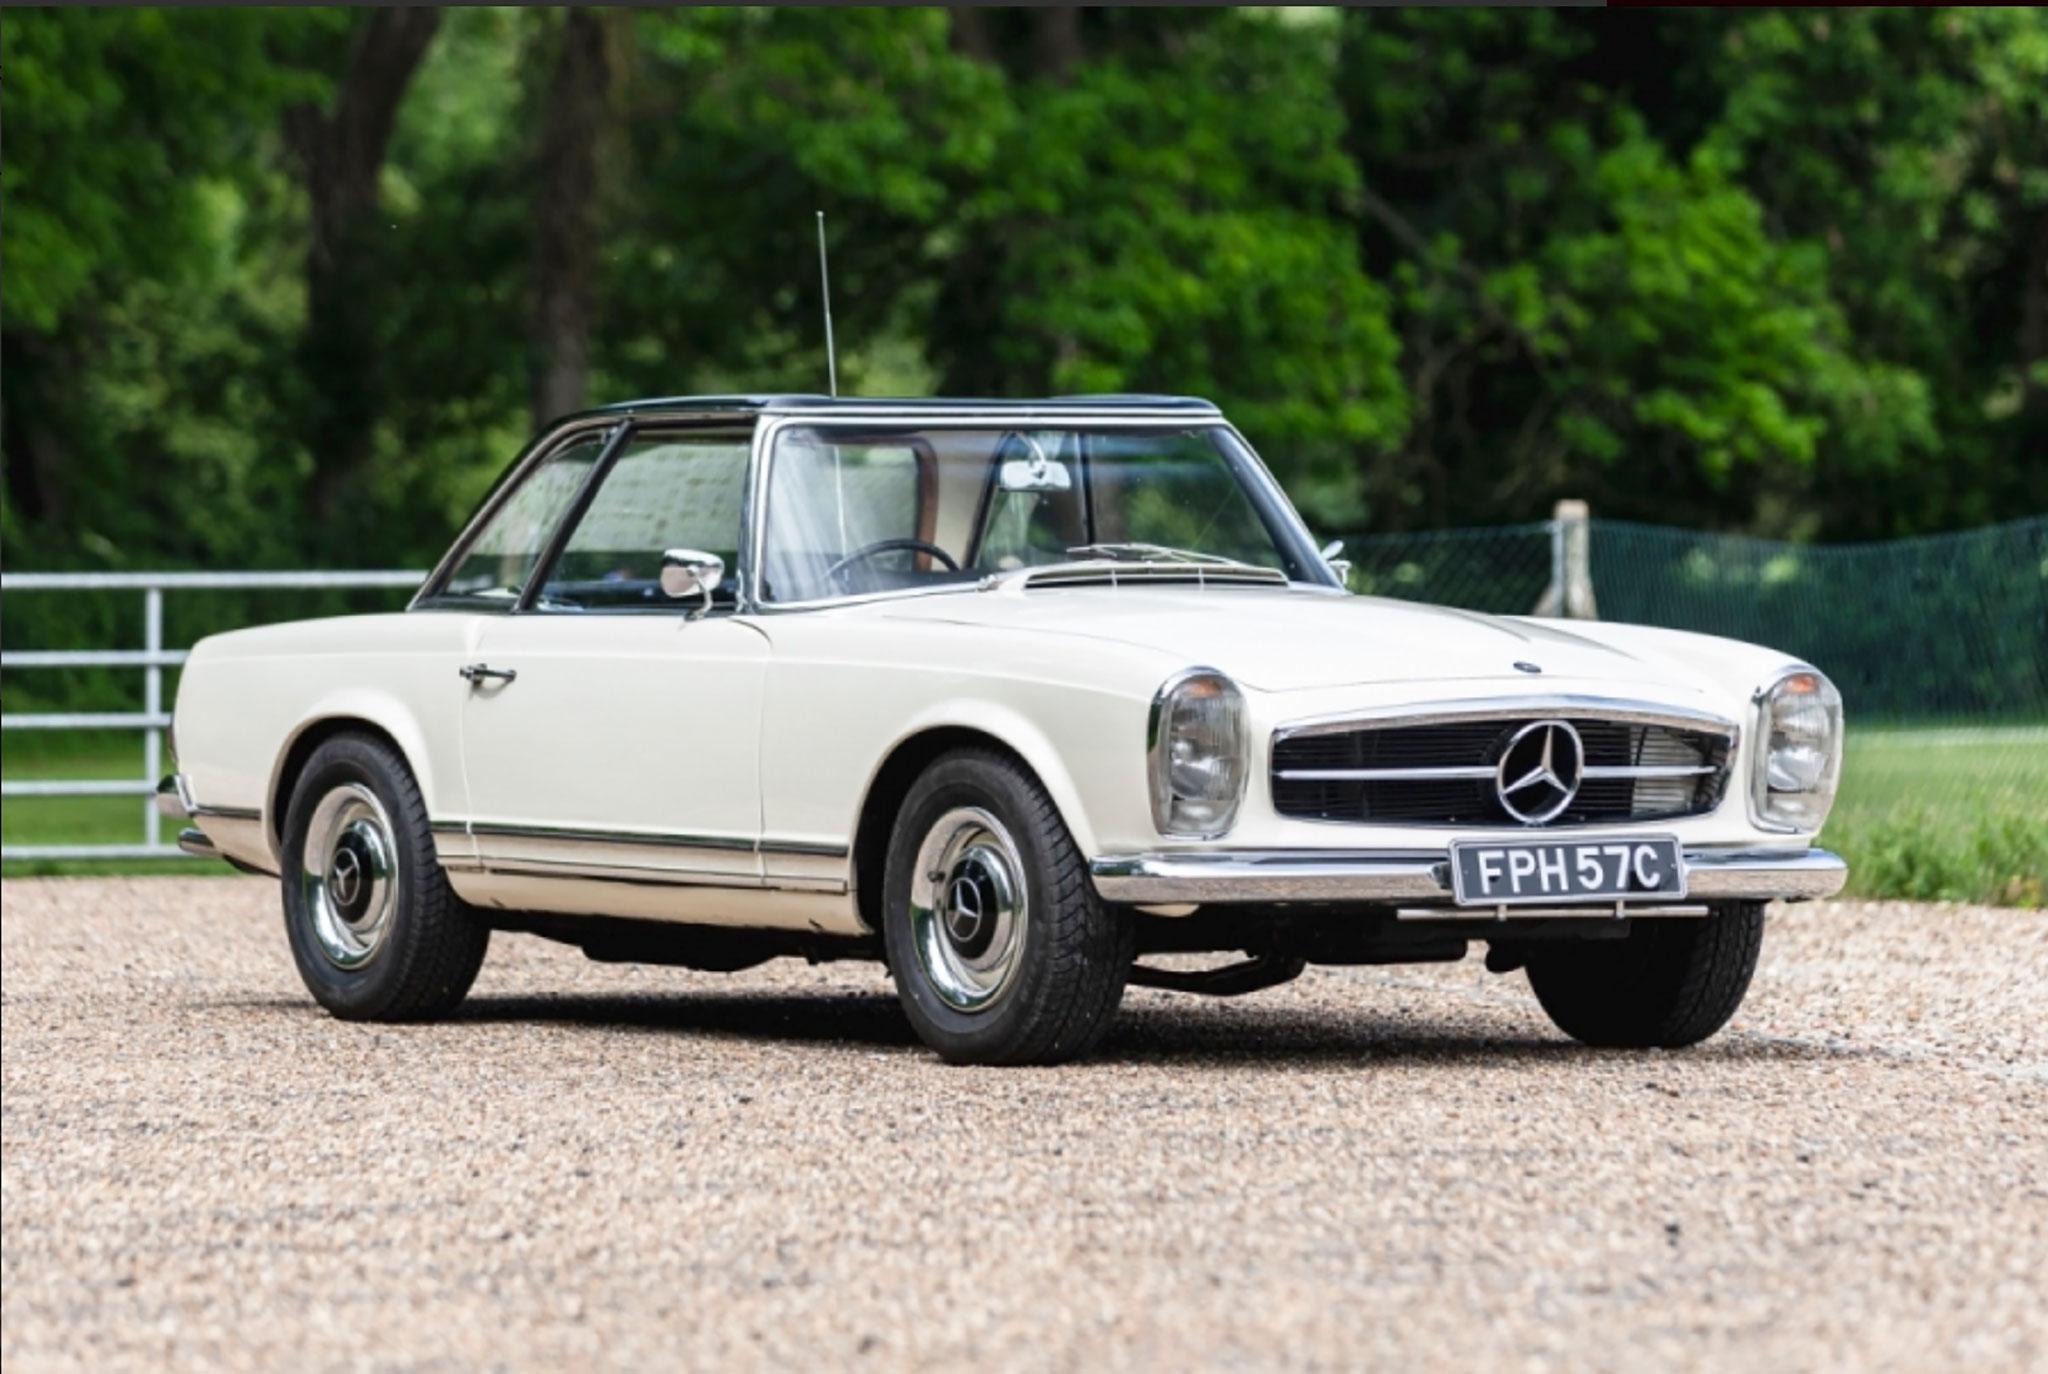 1965 Mercedes-Benz 230SL Ex-Britt Ekland - CCA au London Classic Car Show 2021.